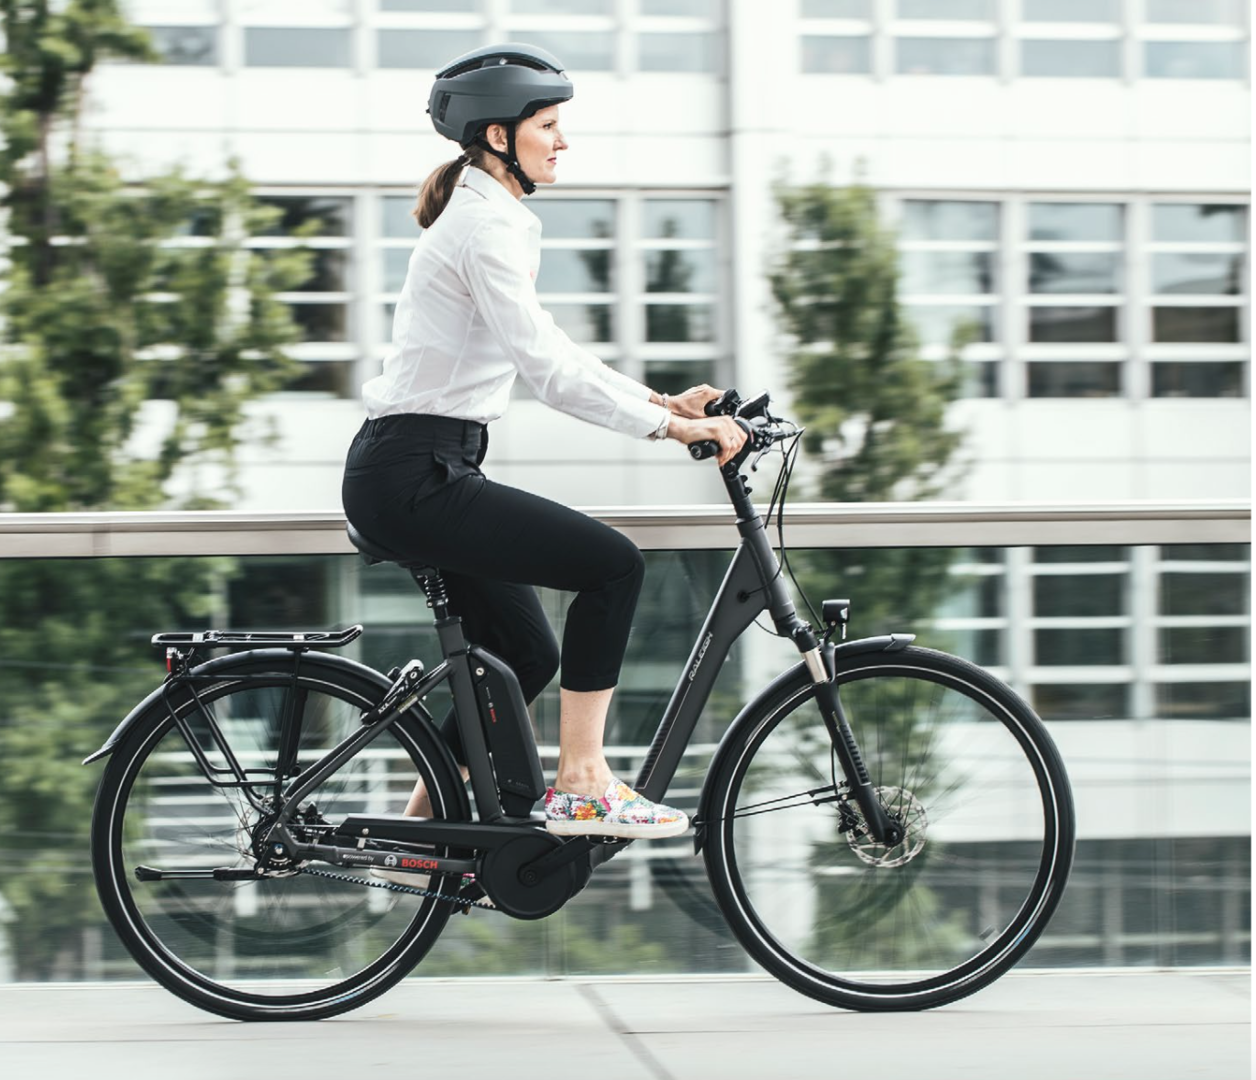 raleigh dover 8 hs 17 0 ah impulse elektro fahrrad 2019 online. Black Bedroom Furniture Sets. Home Design Ideas